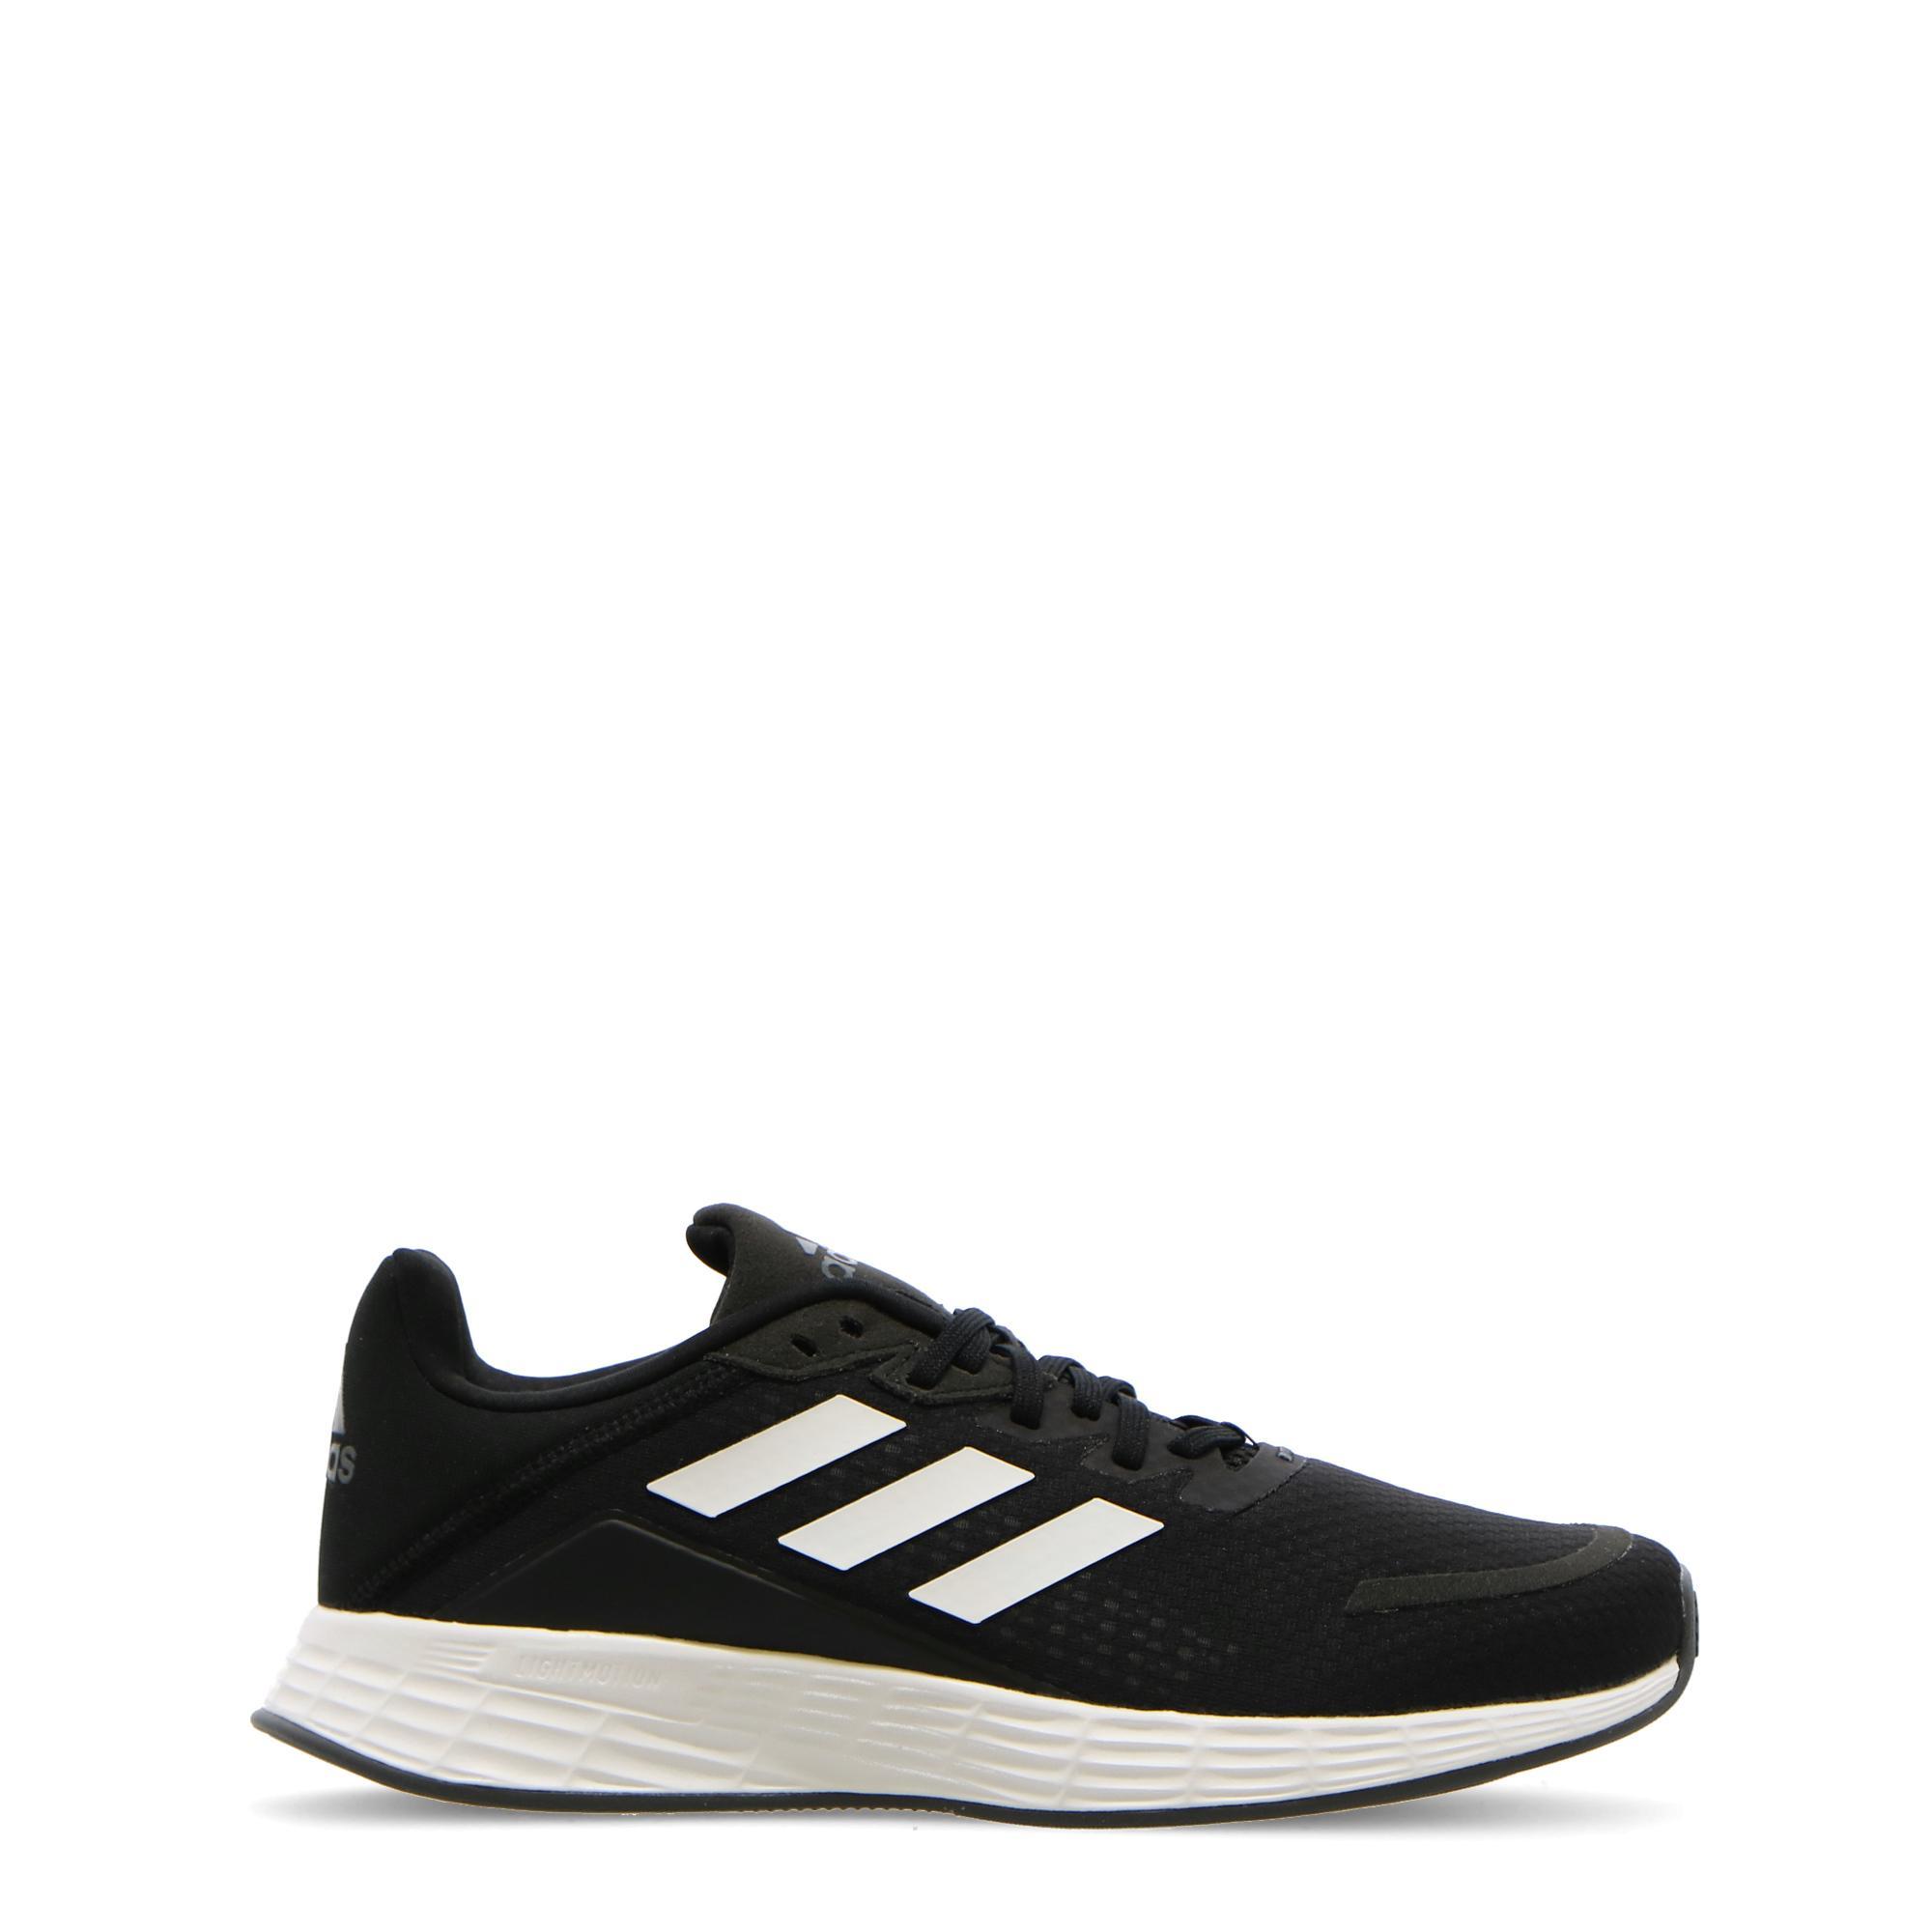 Adidas Duramo Sl Core black white grey six